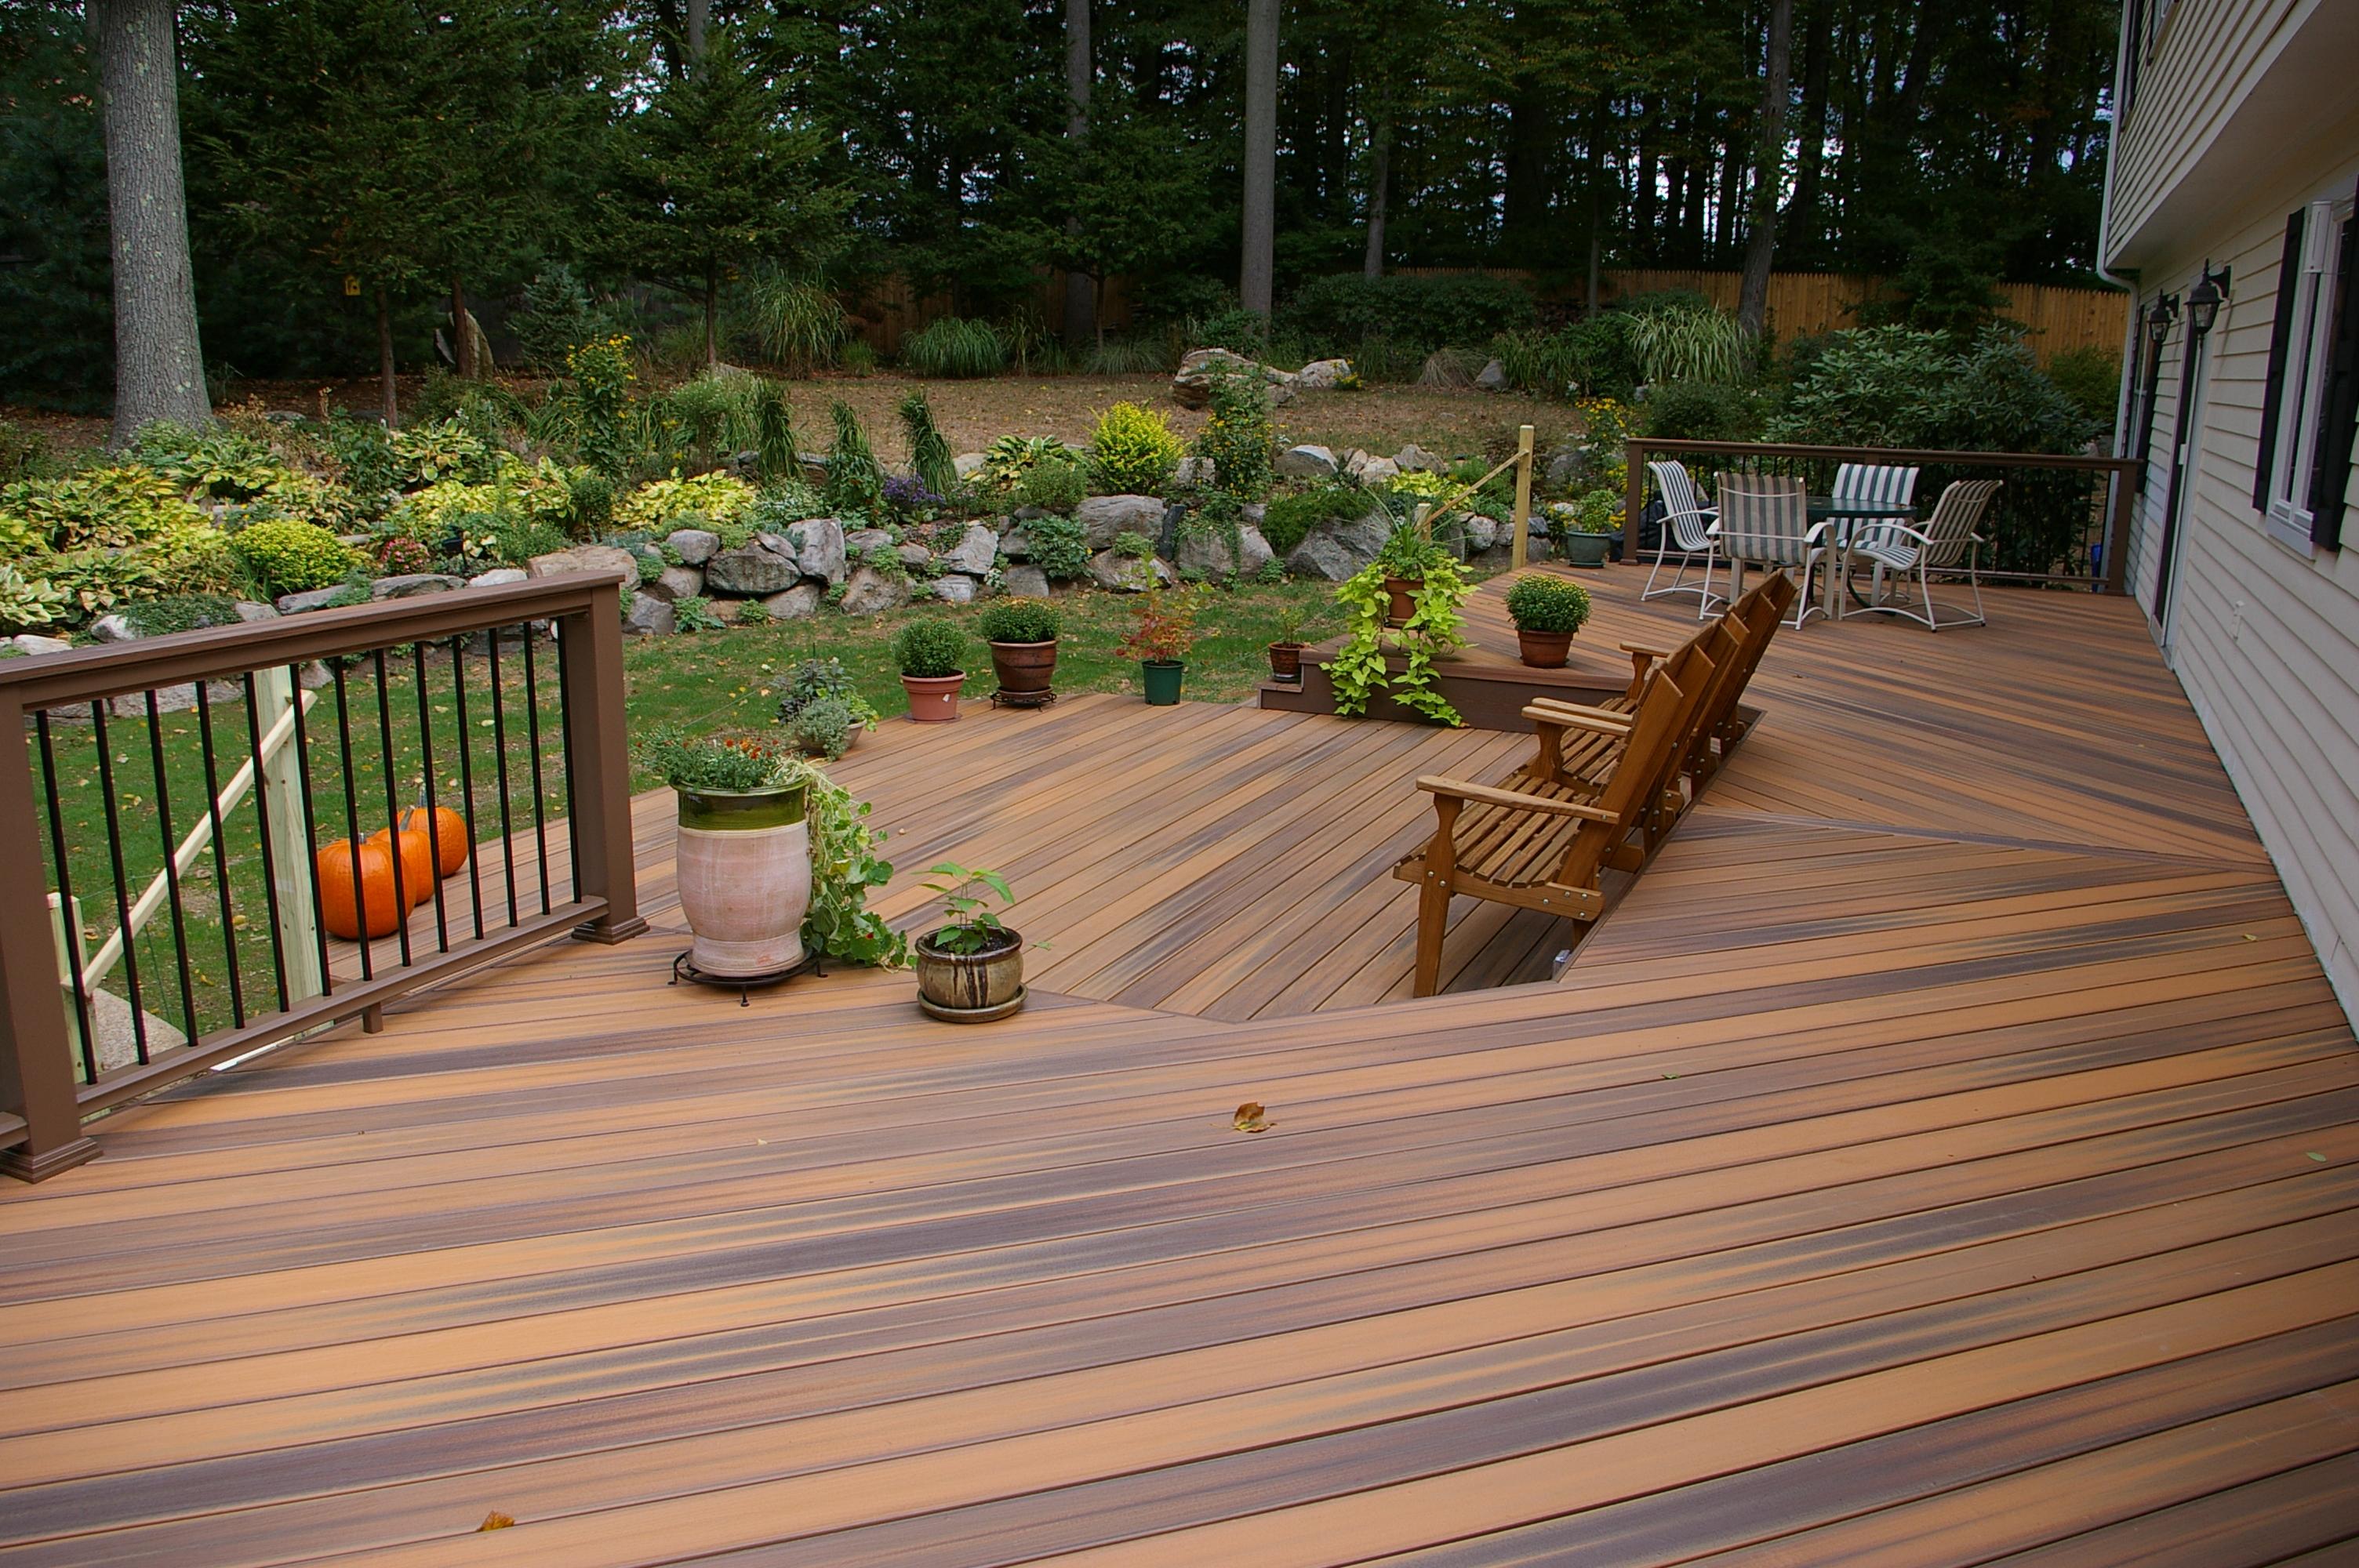 Outdoor Life and your Backyard | Custom Decks of Fairfield ... on Backyard Wood Patio Ideas id=81951